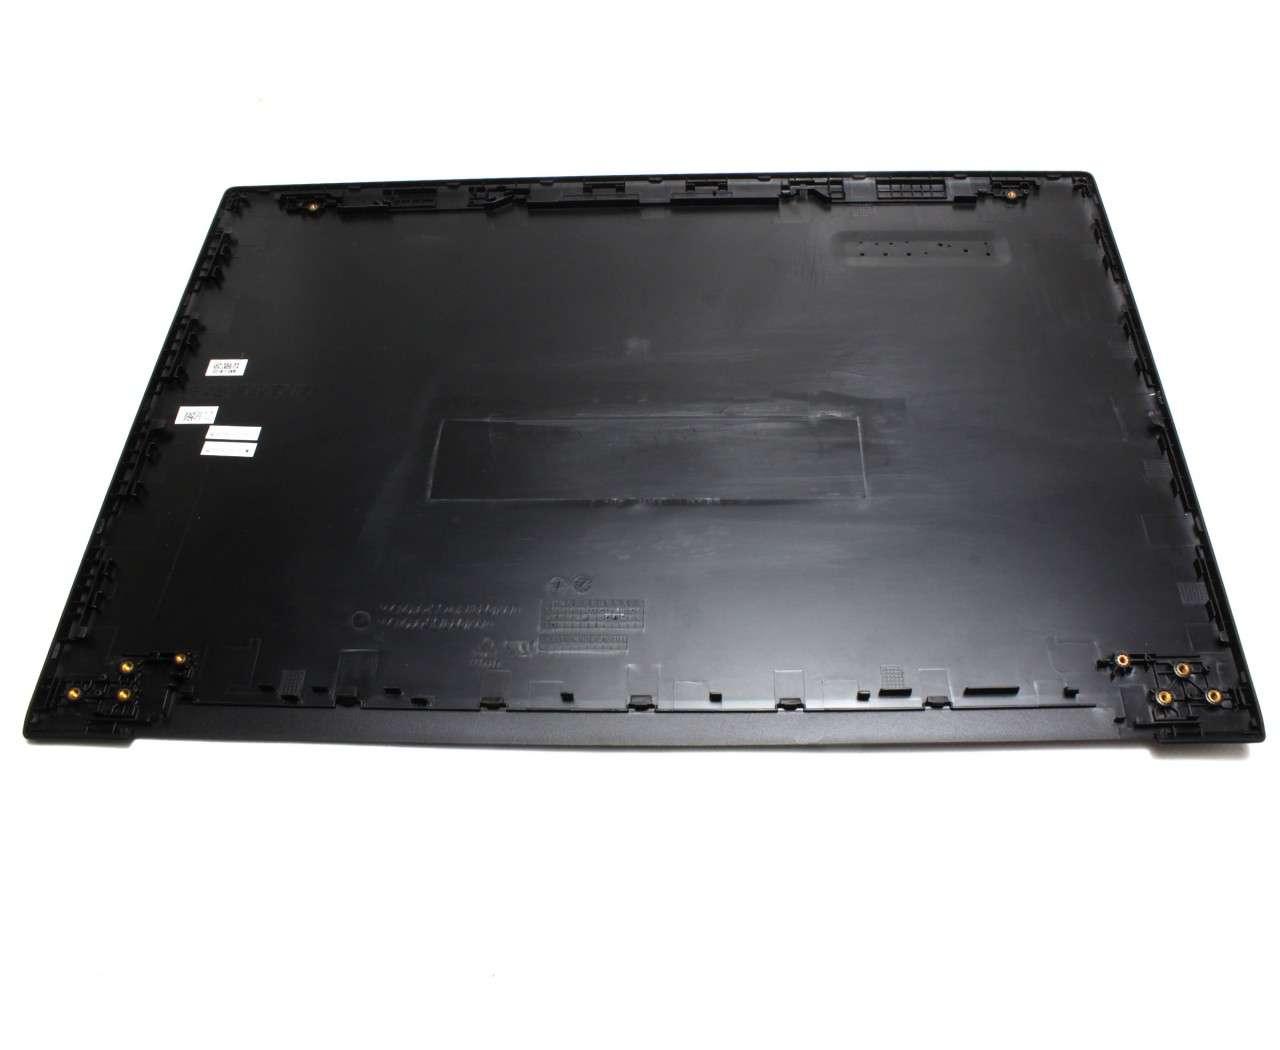 Capac Display BackCover Lenovo E52-80 Carcasa Display imagine powerlaptop.ro 2021